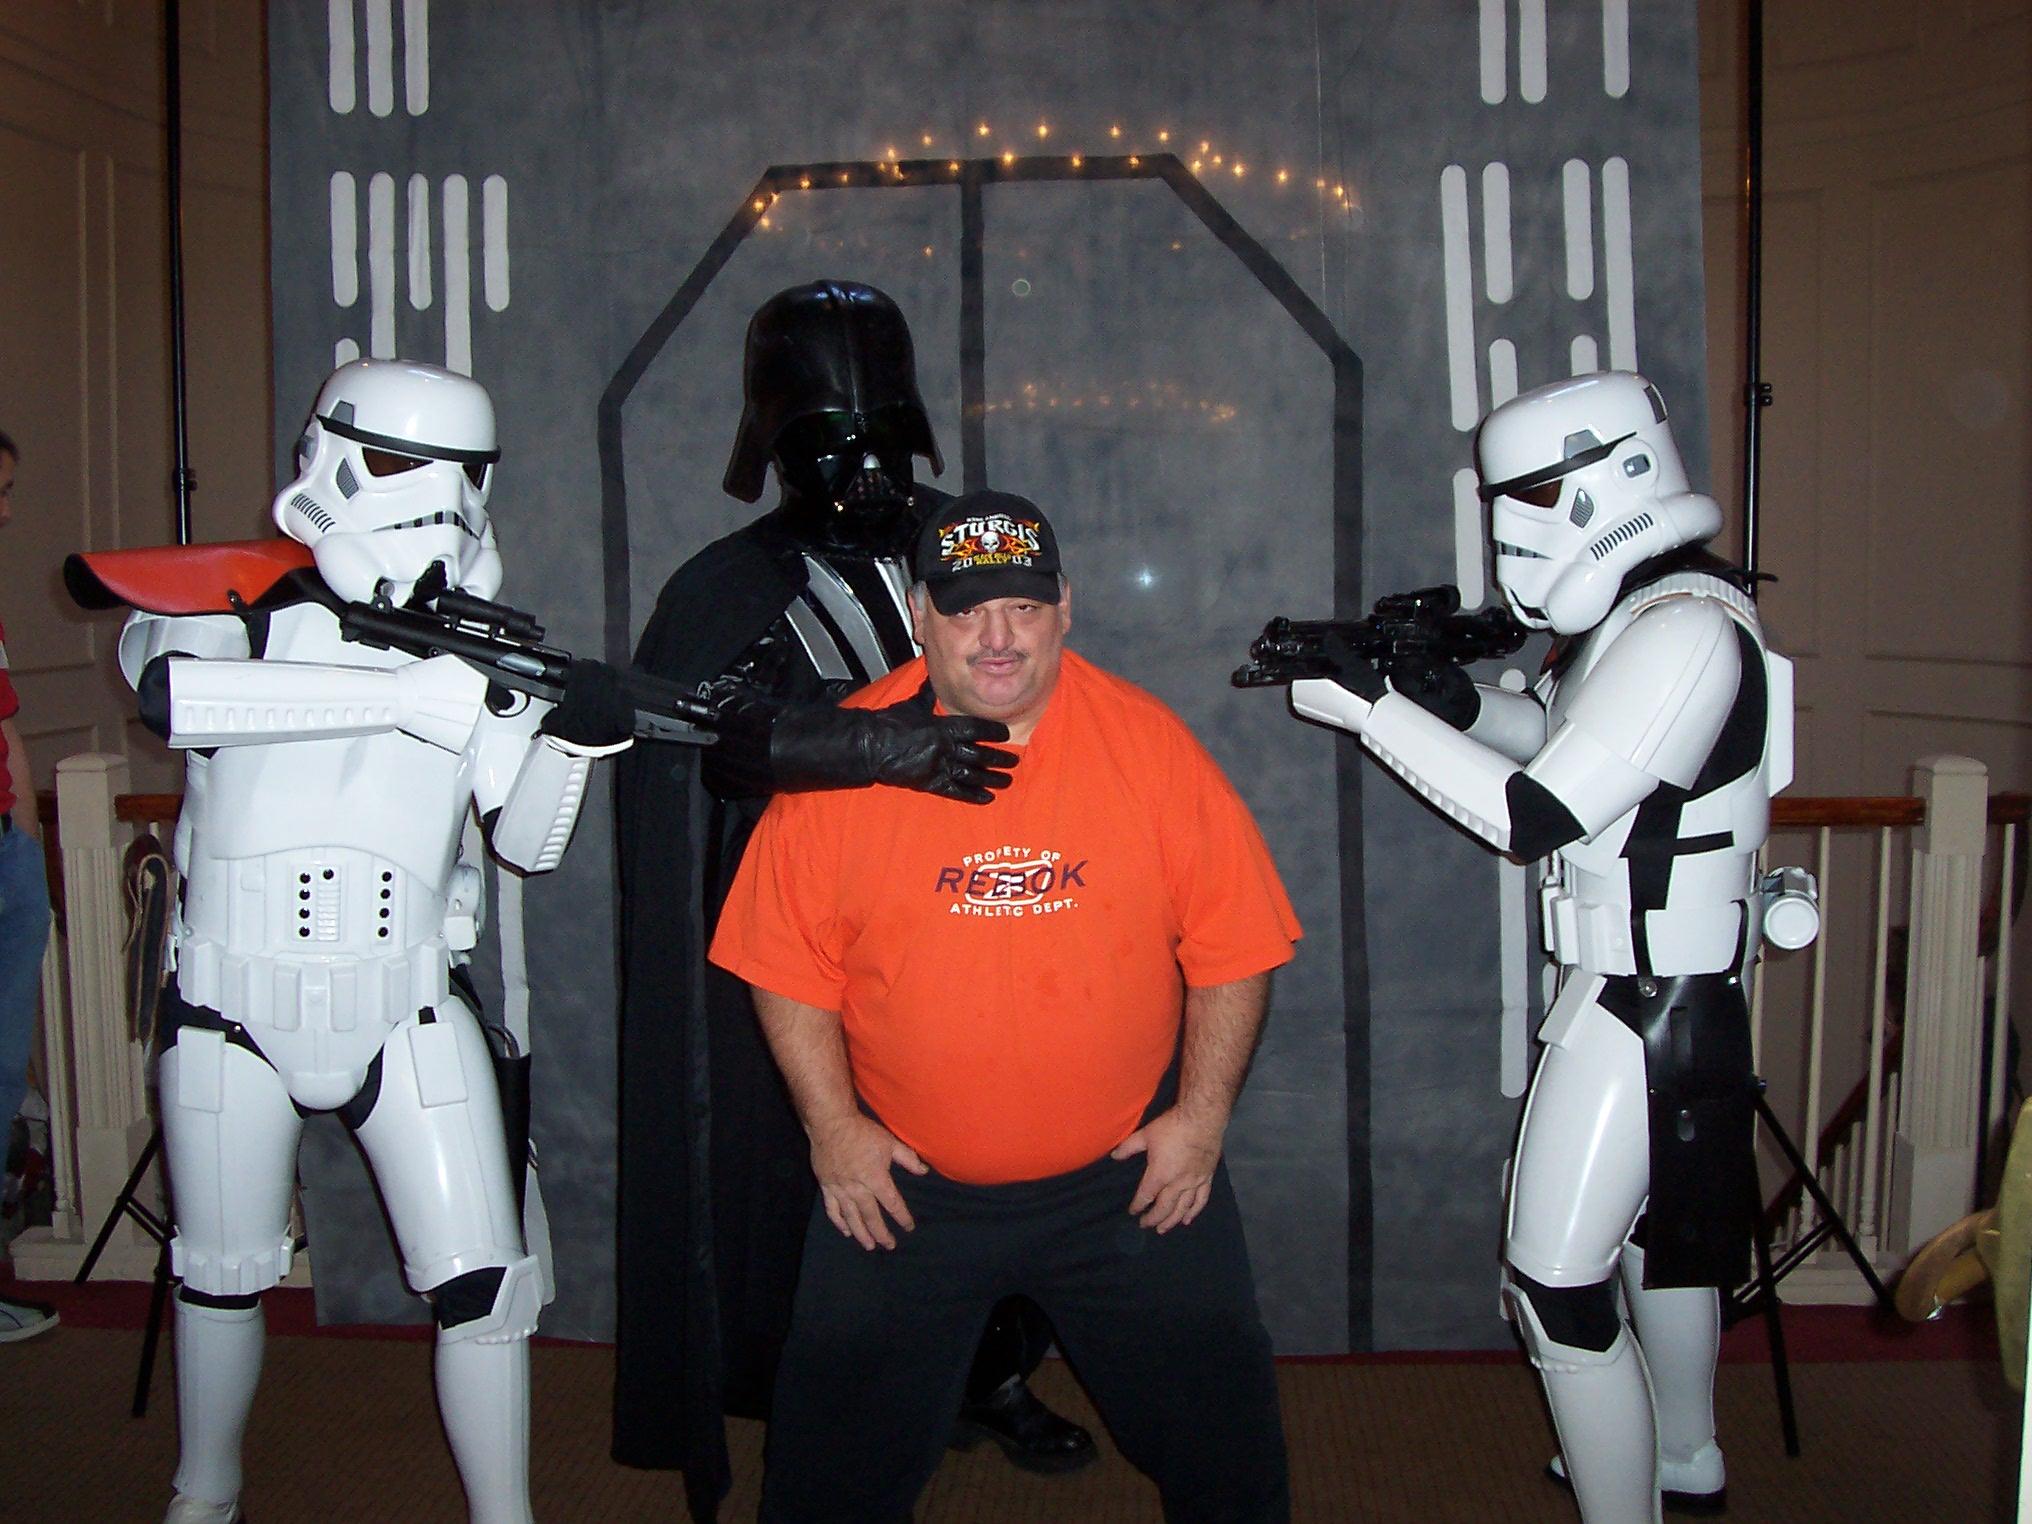 The Empire Strikes Bull